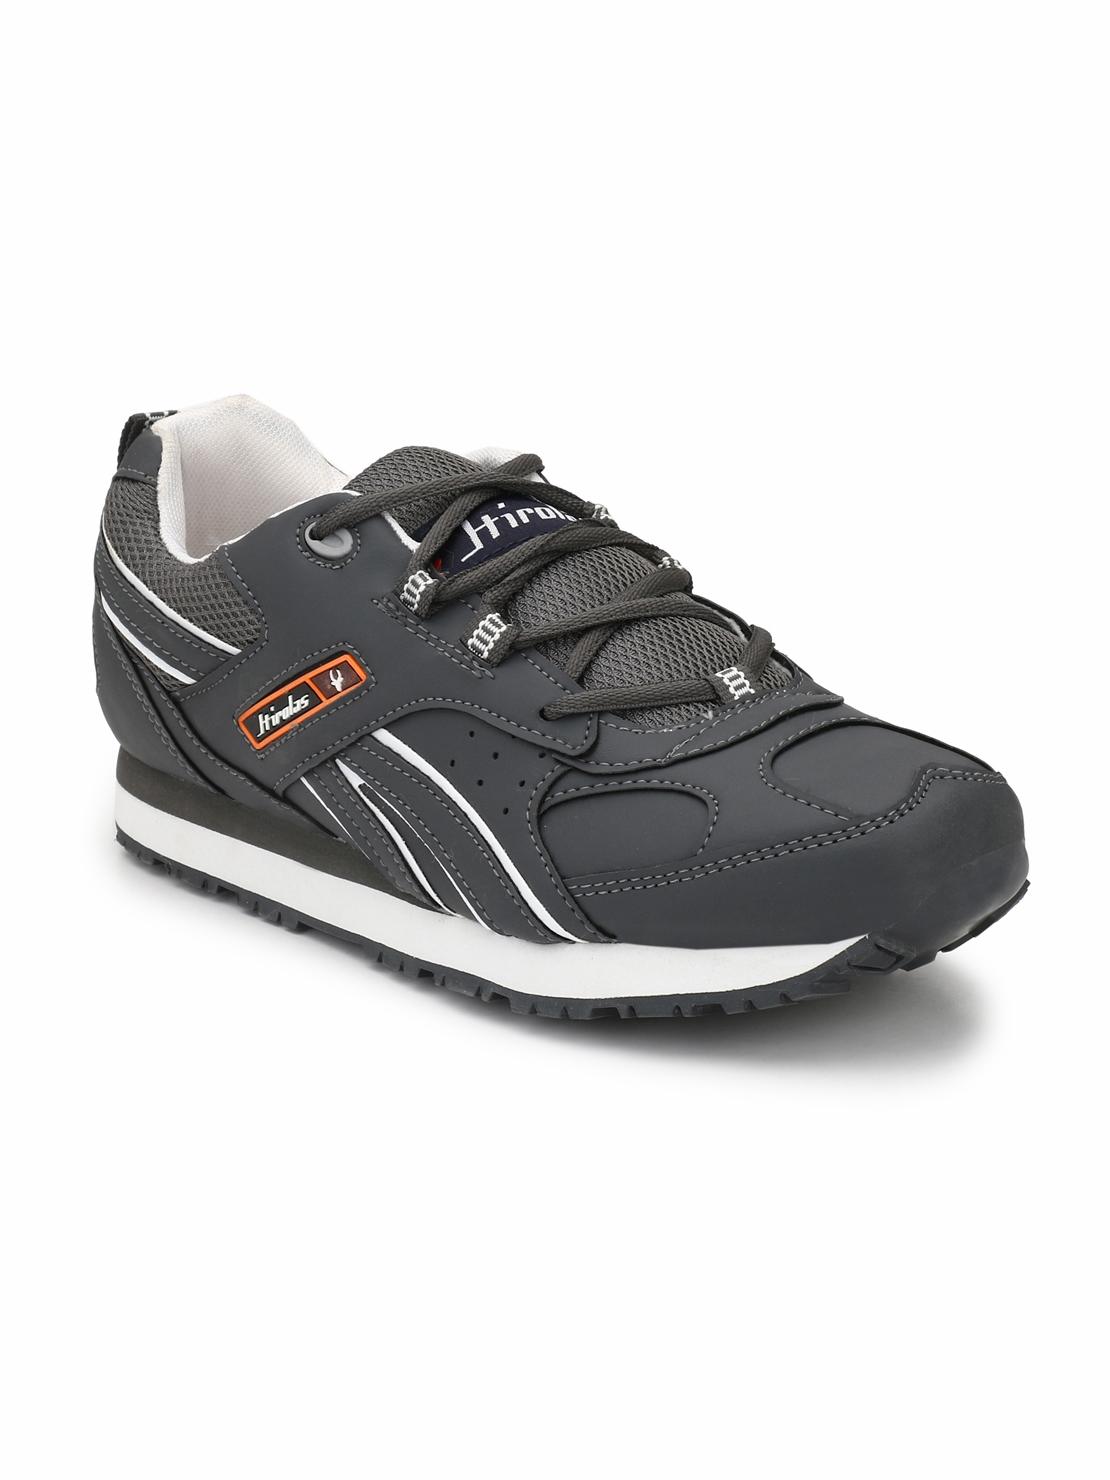 Hirolas   Hirolas Men's Multisport Sneaker Shoes- Grey